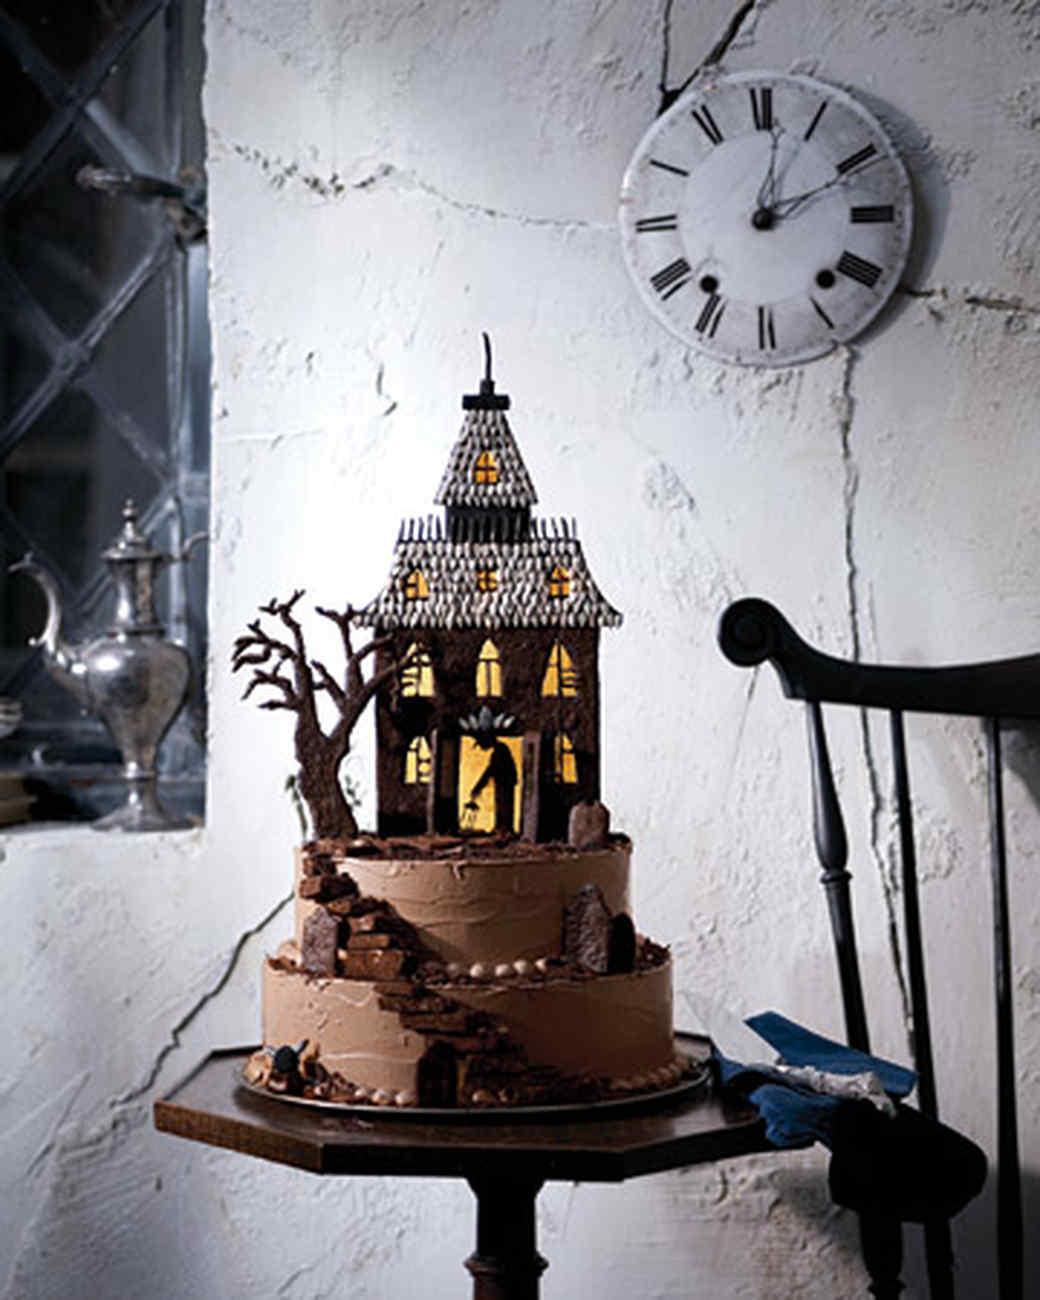 Haunted-House Chocolate Cookies